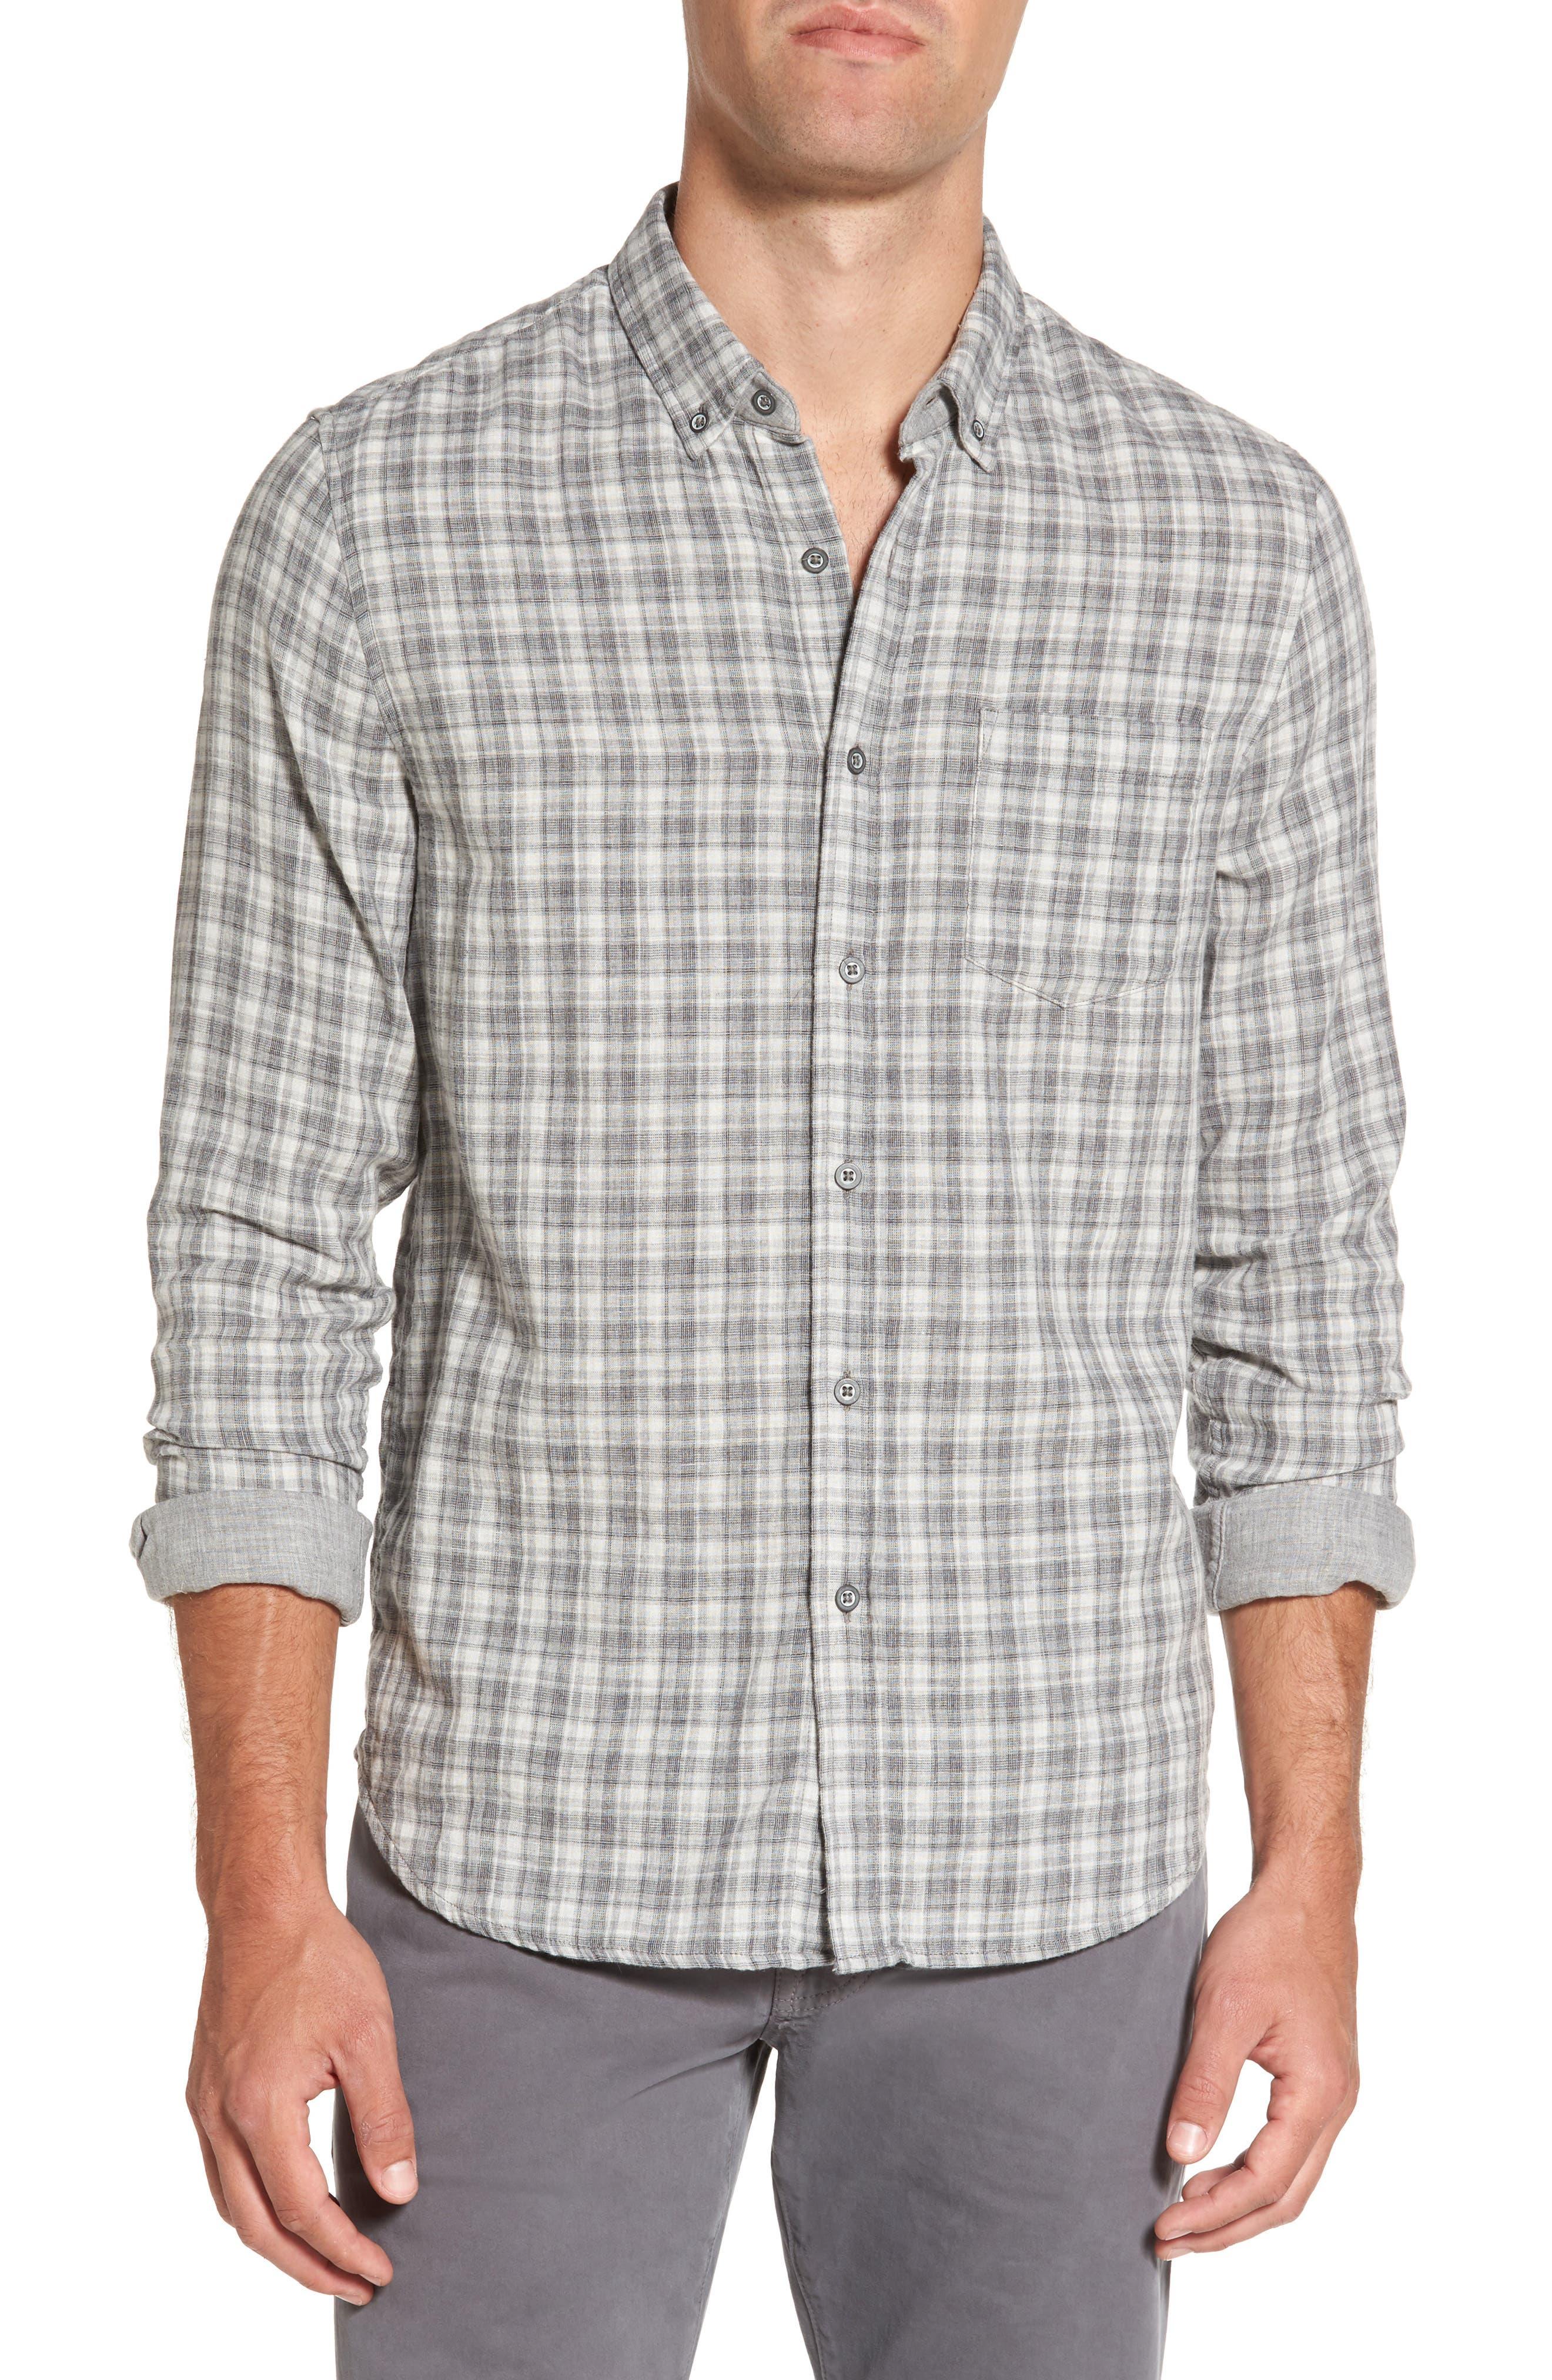 Main Image - AG Grady Plaid Sport Shirt